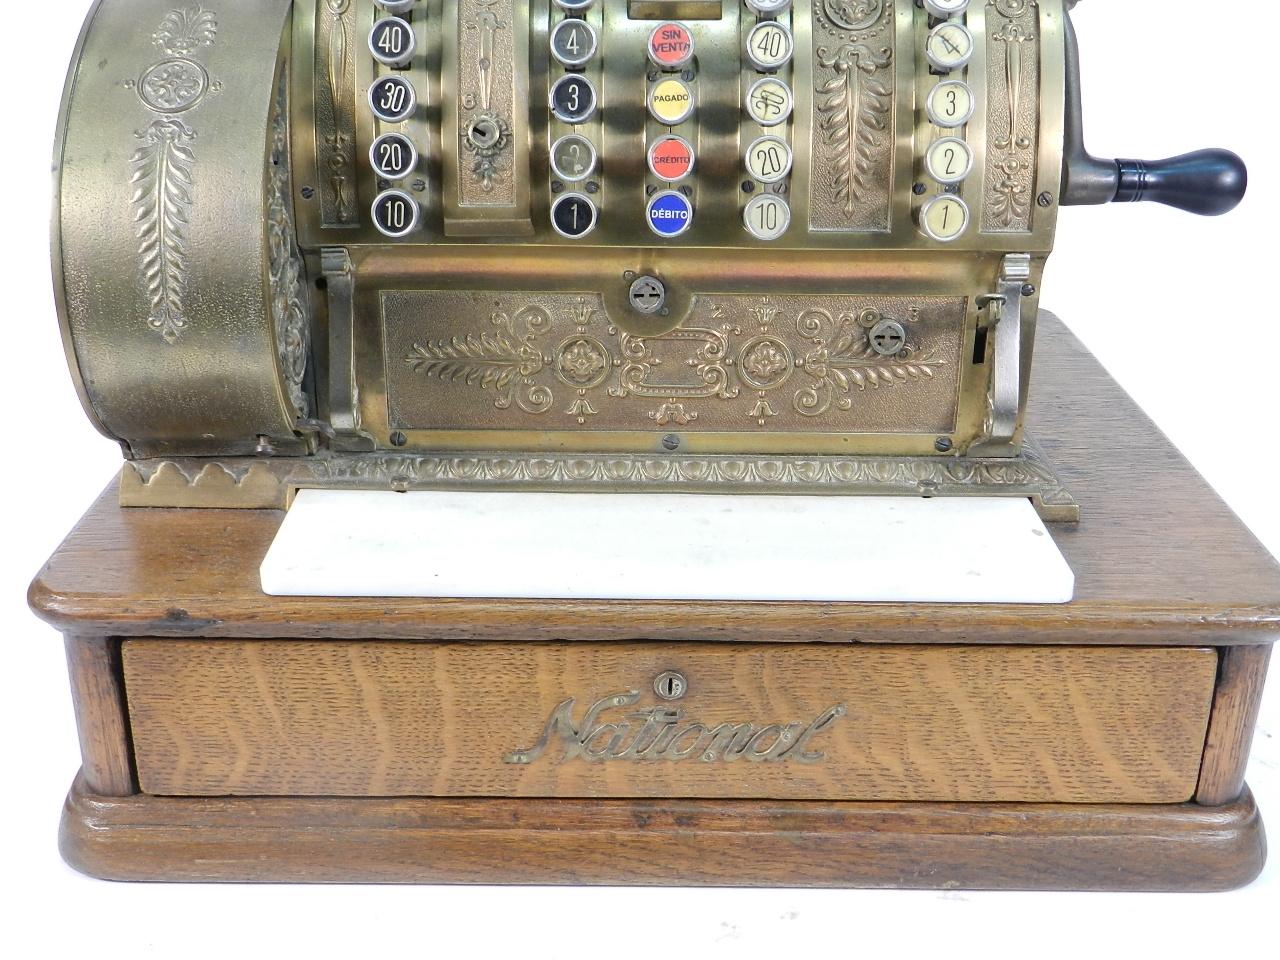 Imagen  NATIONAL Mod.442  AÑO 1915 41047